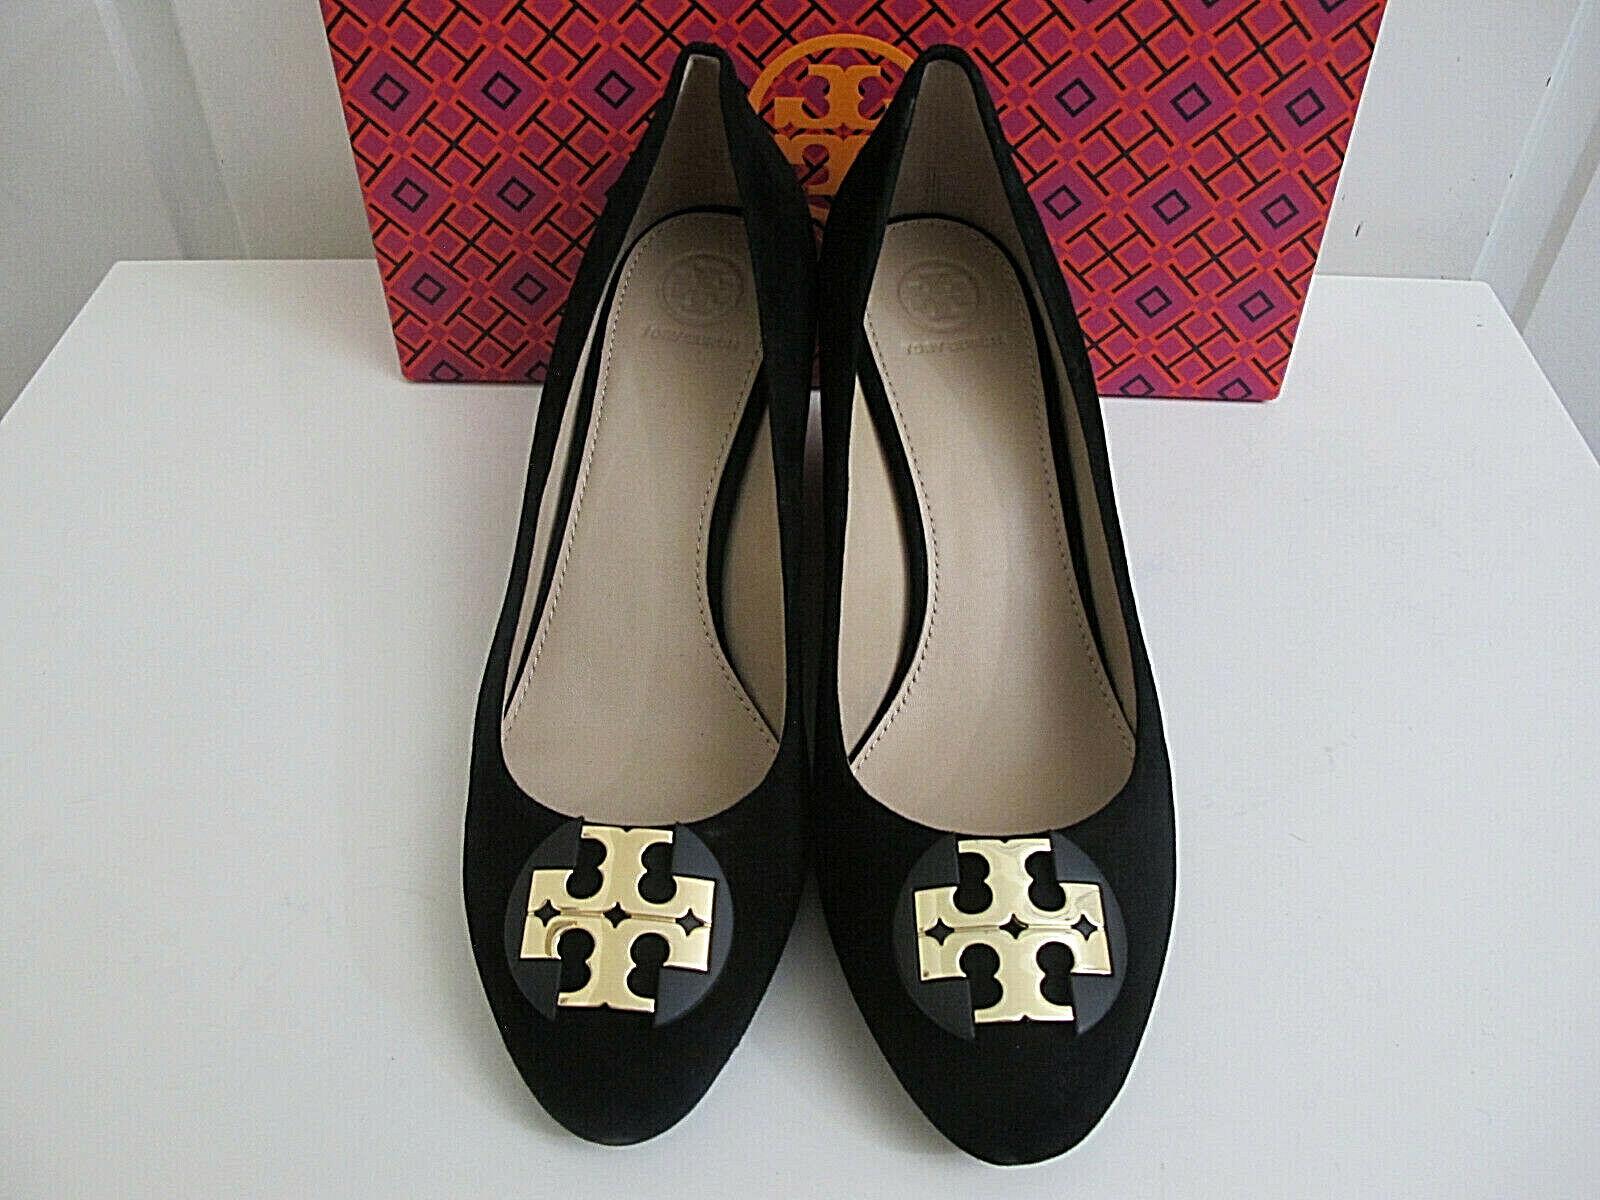 NIB 278 Tory Burch Luna 65 Wedge Pumps Heels Suede Shoes Black sz 9 Chelsea